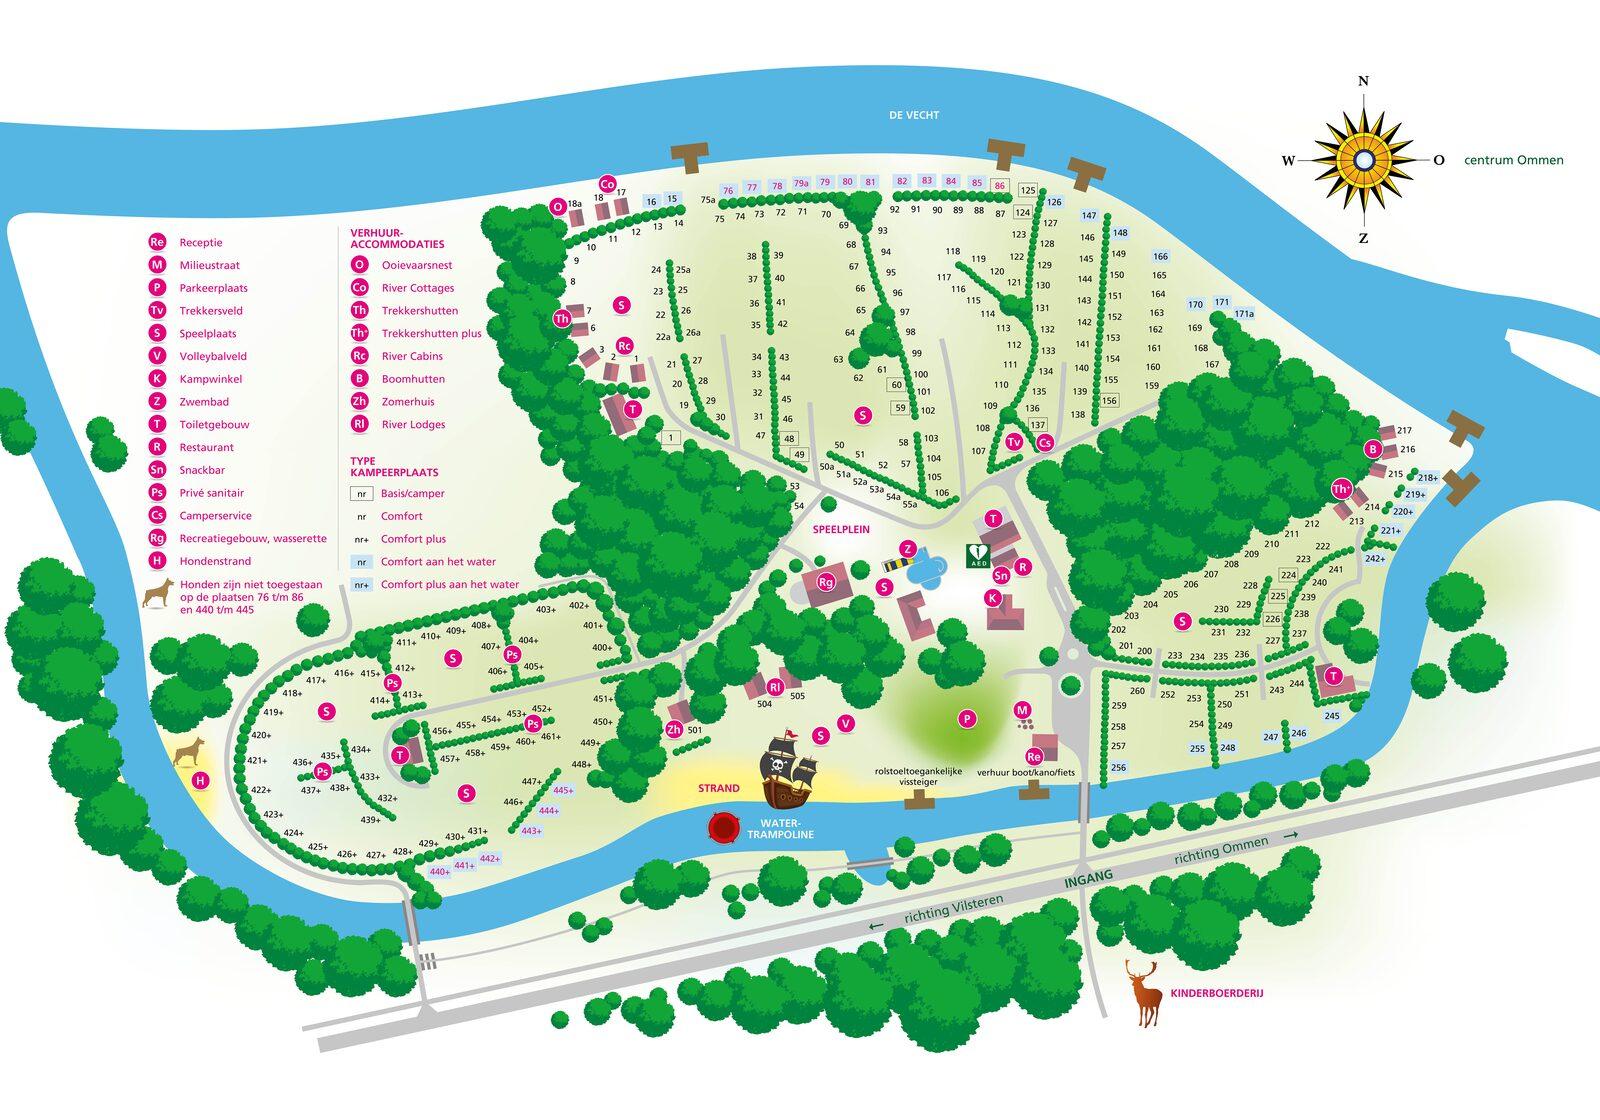 Camping de Koeksebelt Ommen Plattegrond 2020